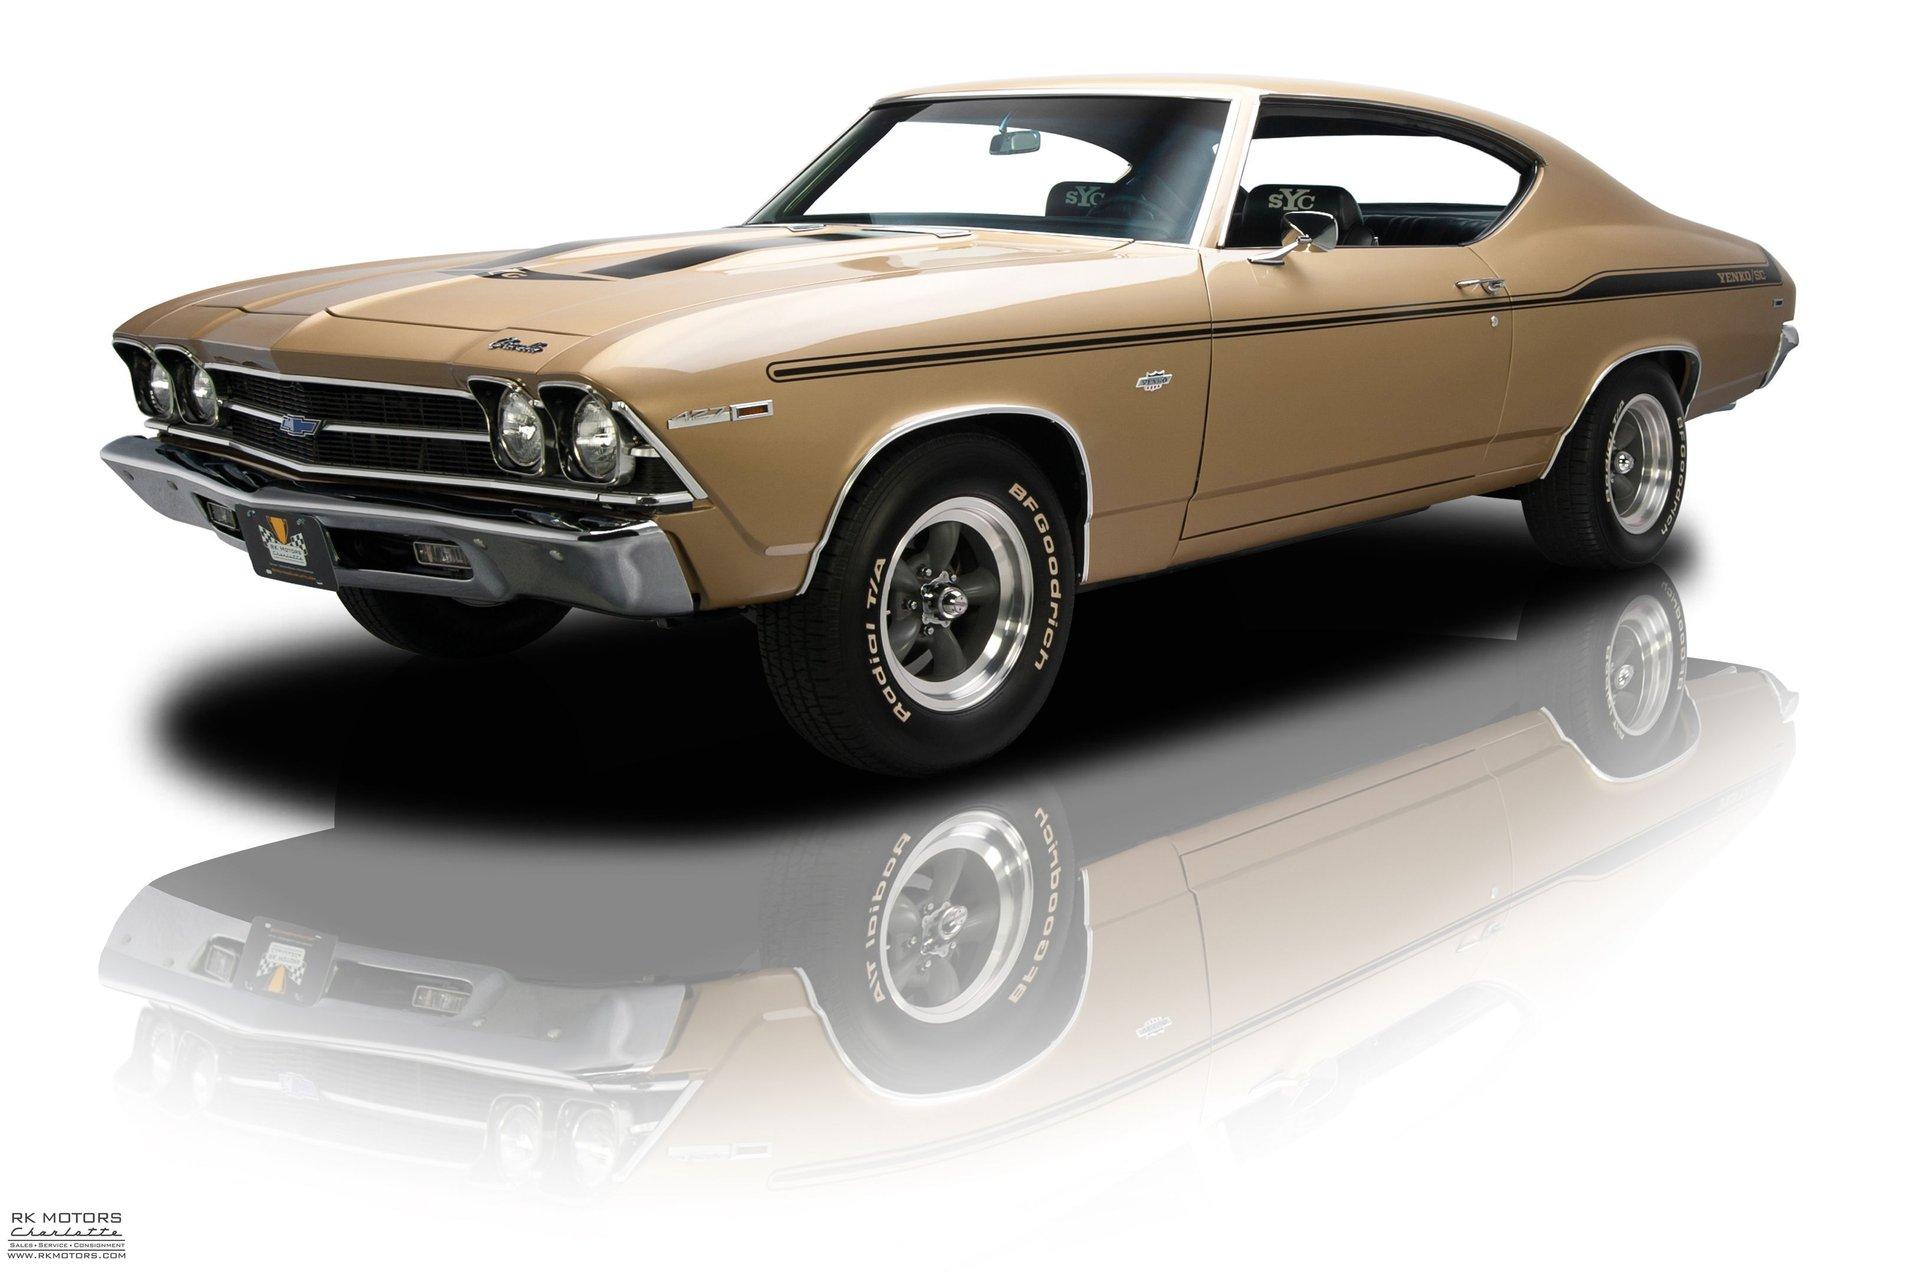 134138 1969 Chevrolet Chevelle RK Motors Classic Cars for Sale